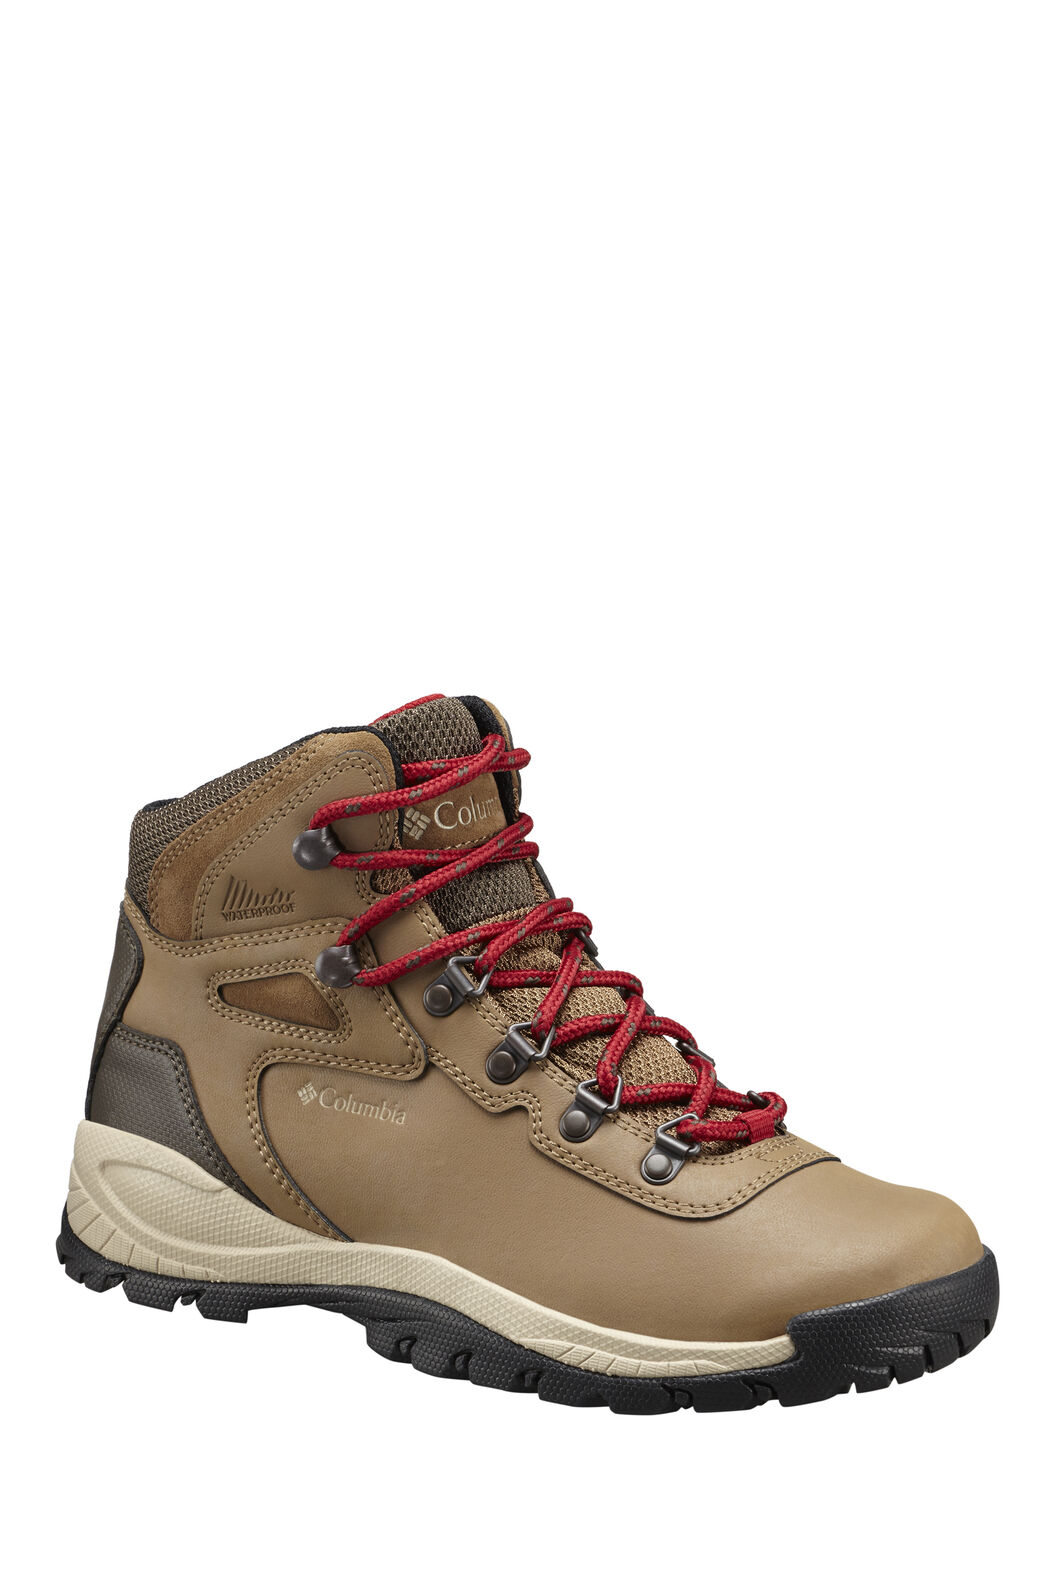 Columbia Women's Newton Ridge Plus Hiking Boot, Red, hi-res